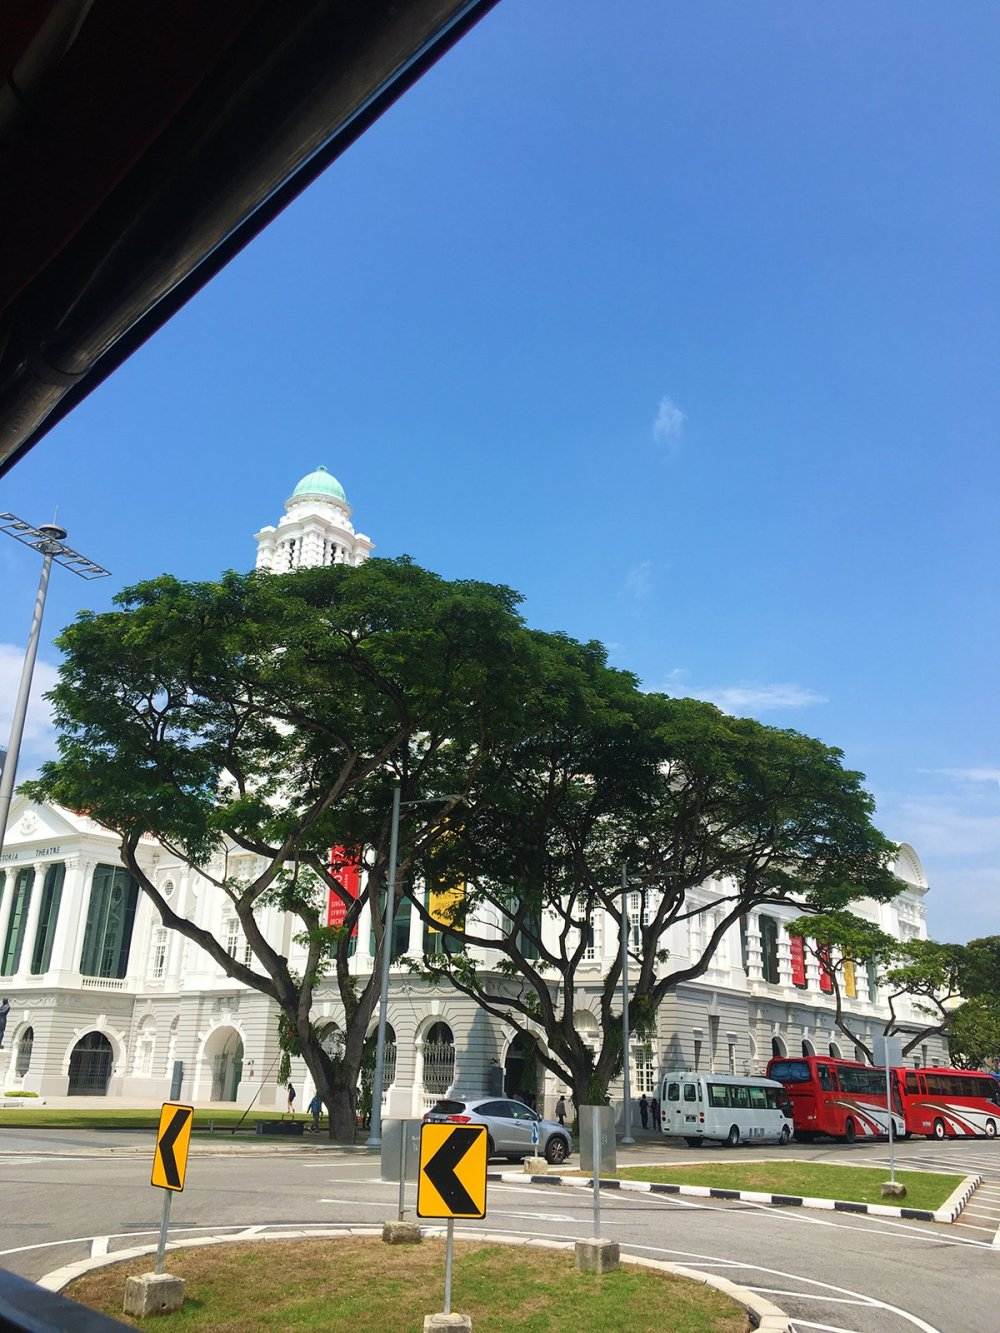 DUCKTOURS SINGAPORE SCENERY 6